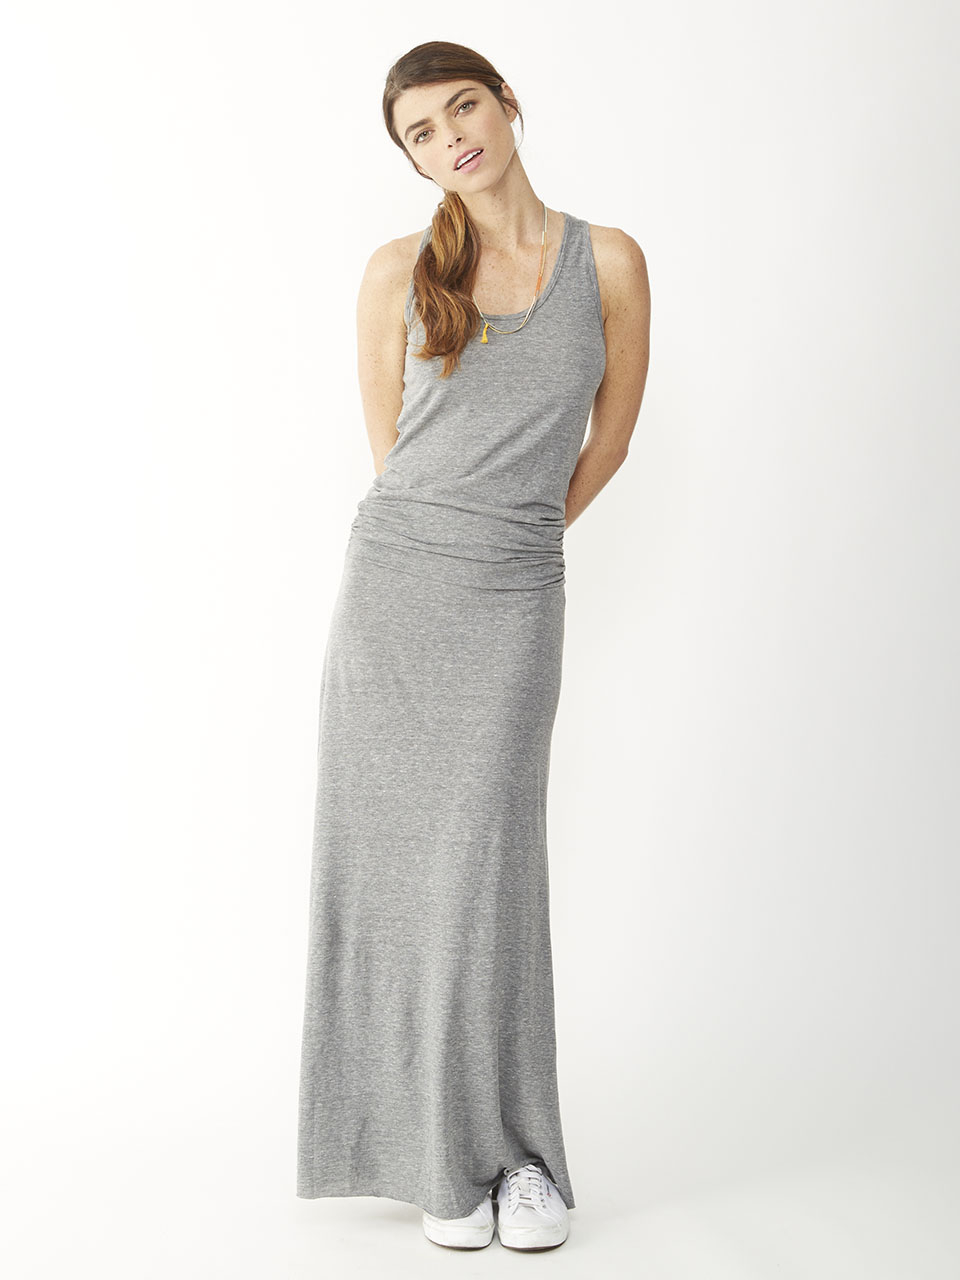 Lyst Alternative Apparel Go Fish Racerback Maxi Dress In Gray